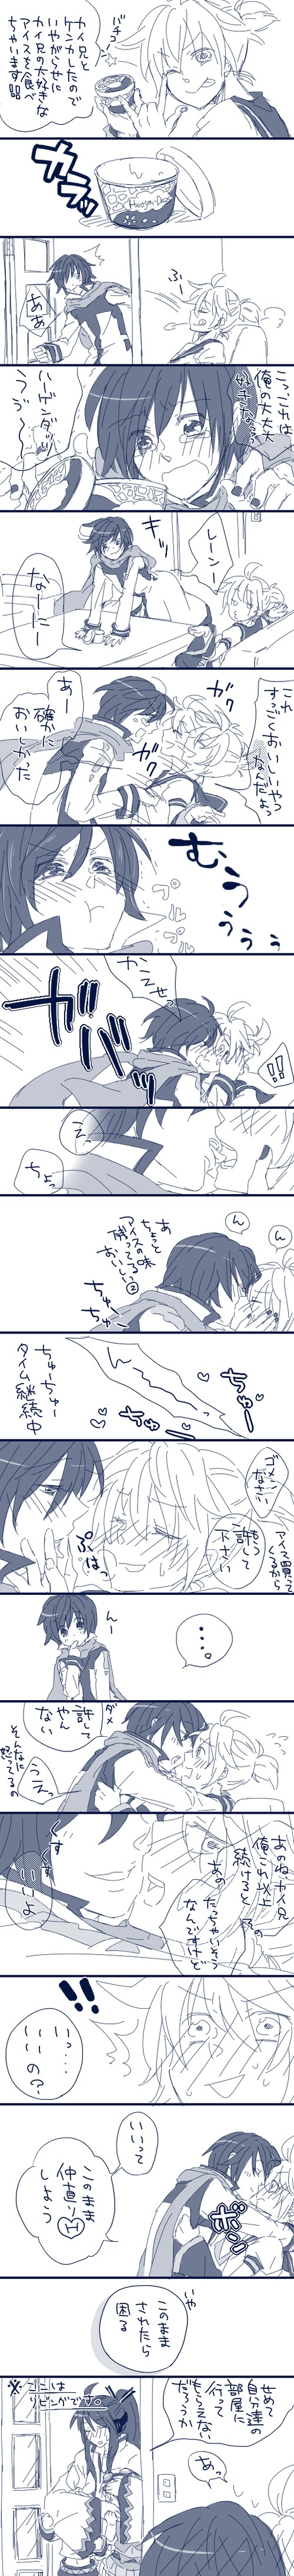 Tags: Anime, VOCALOID, KAITO, Kagamine Len, GUMI, Kagamine Rin, Kamui Gakupo, Sketch, Pixiv, Comic